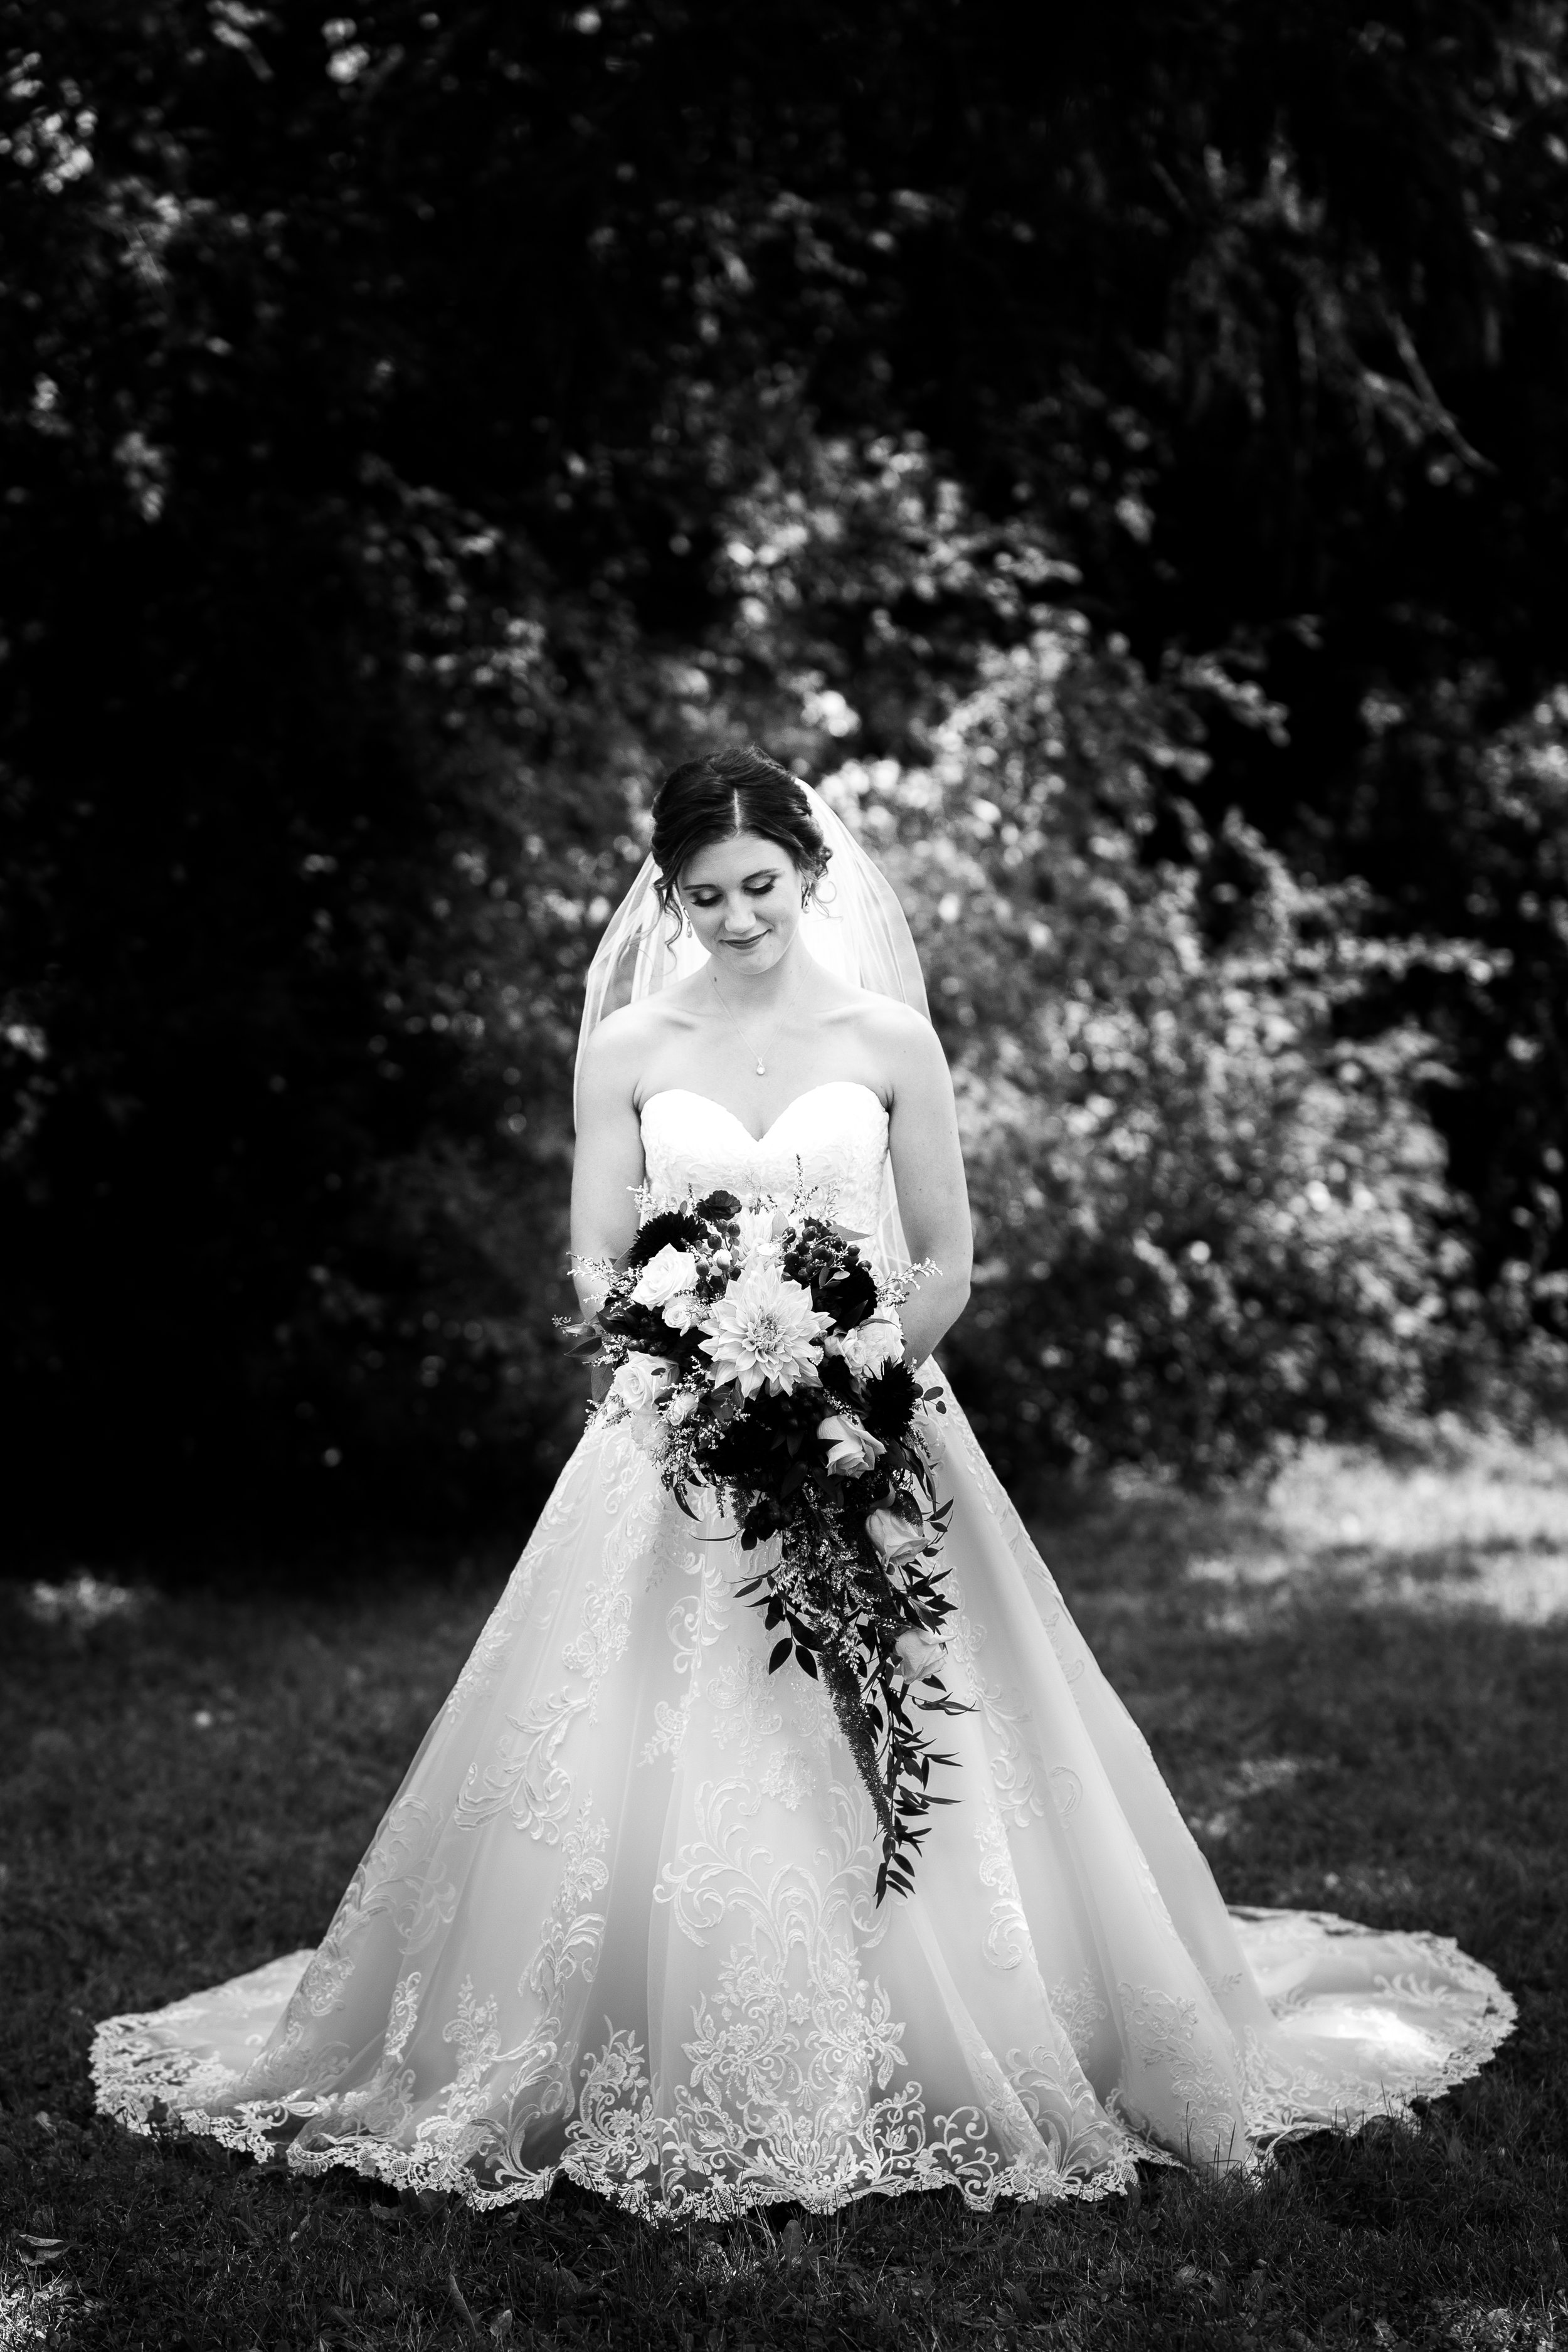 Black-White-BrideWedding-Jodie-Aldred-Photography-Chatham-Kent-Elgin-Middlesex-London-Ontario.JPG